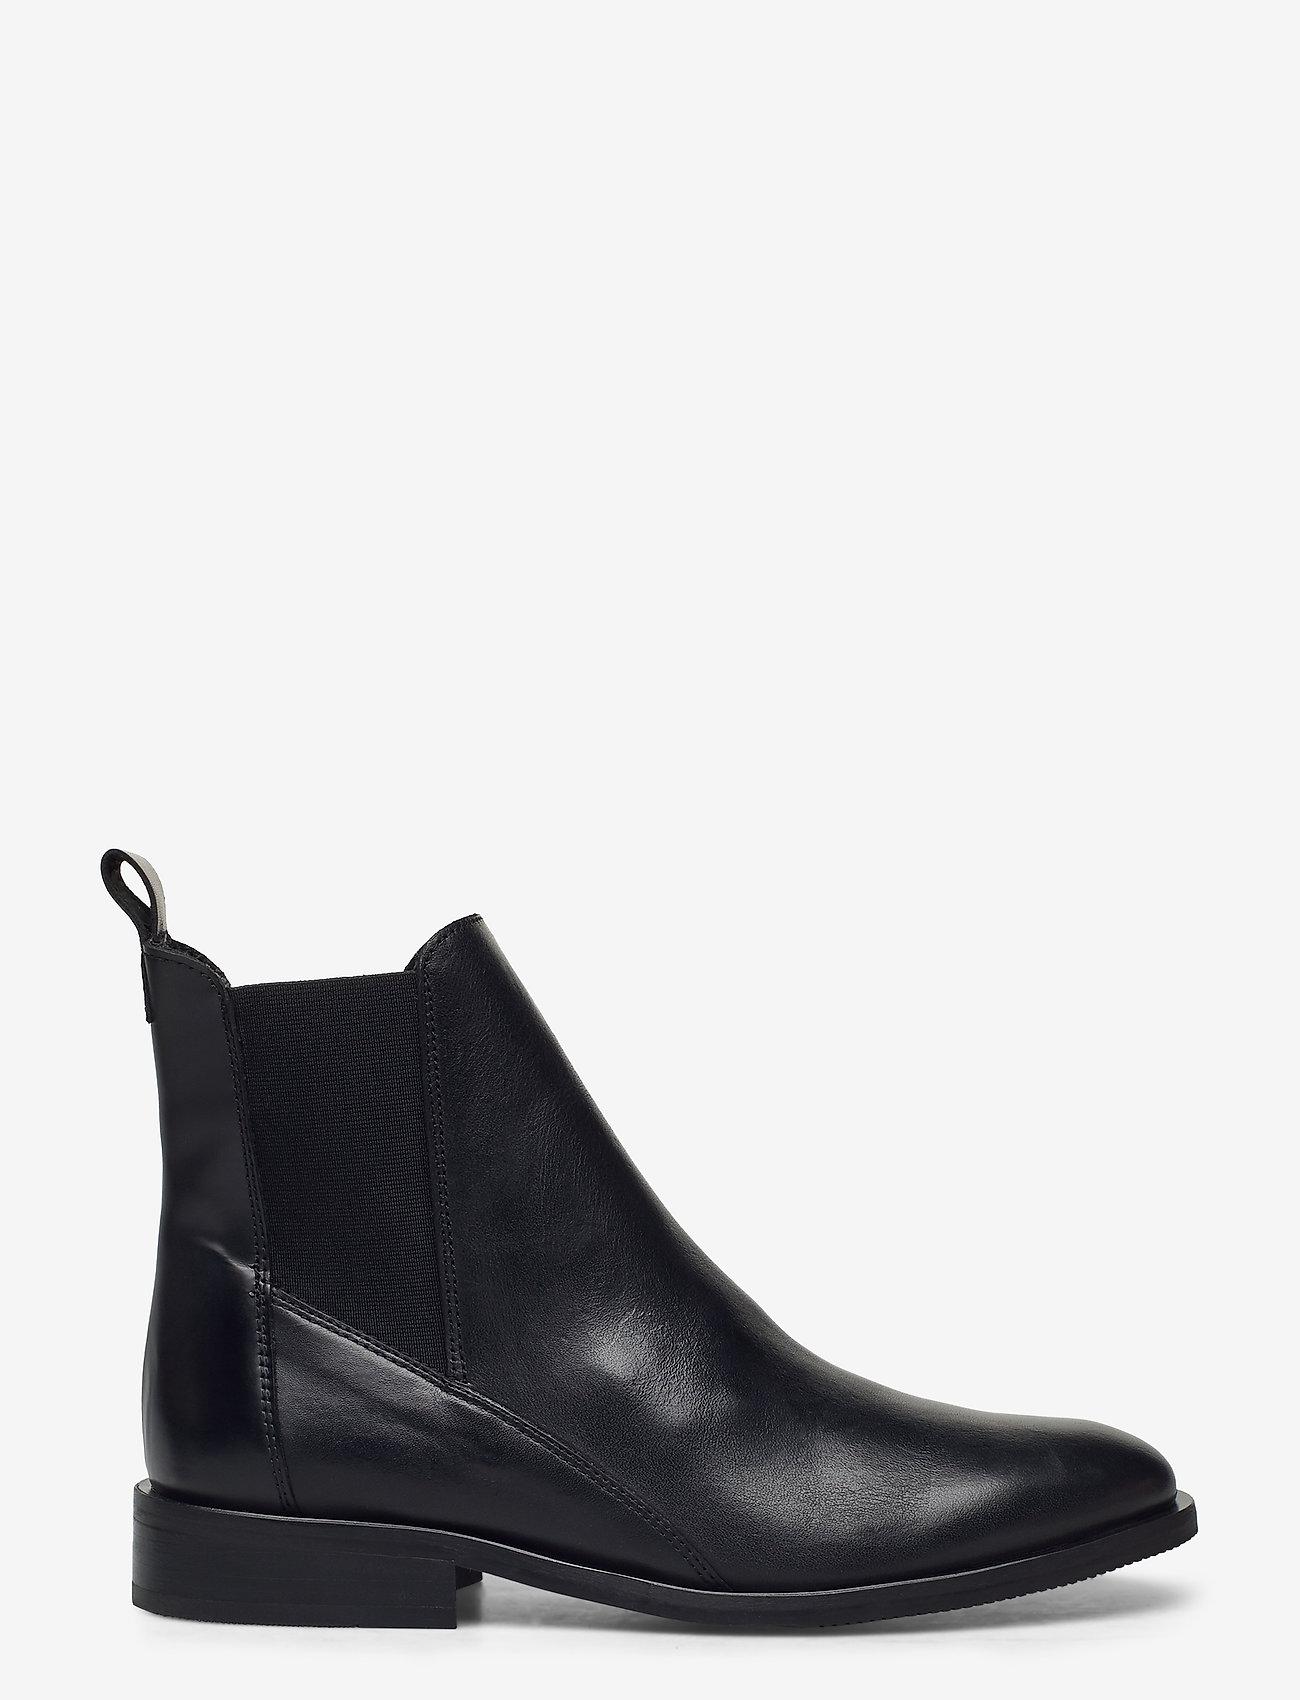 Shoe The Bear - STB-FINNA CHELSEA L - chelsea boots - black - 1